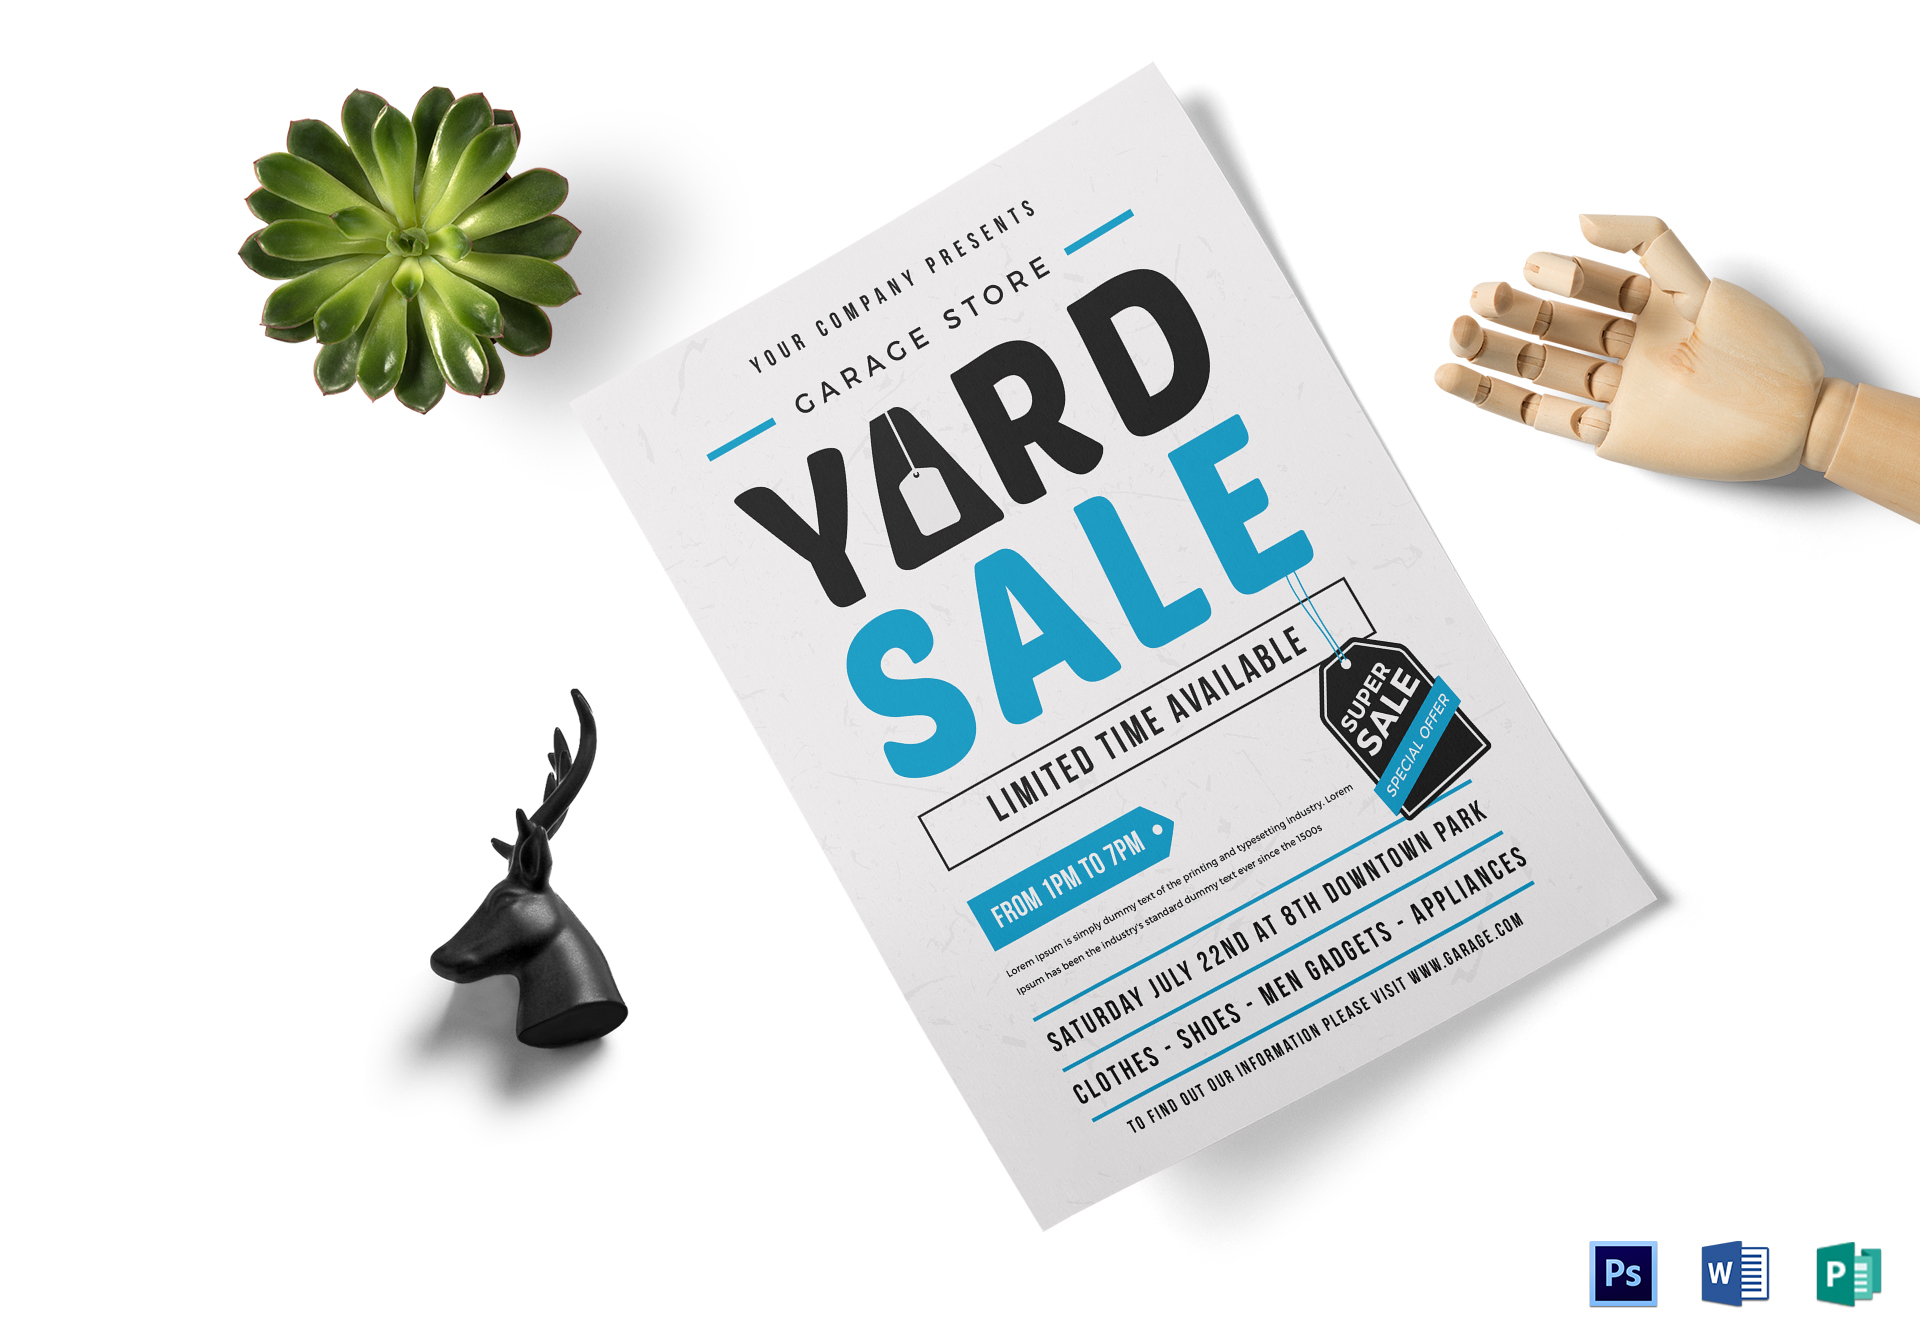 Unique Yard Sale Flyer Design Template In Word Psd Illustrator